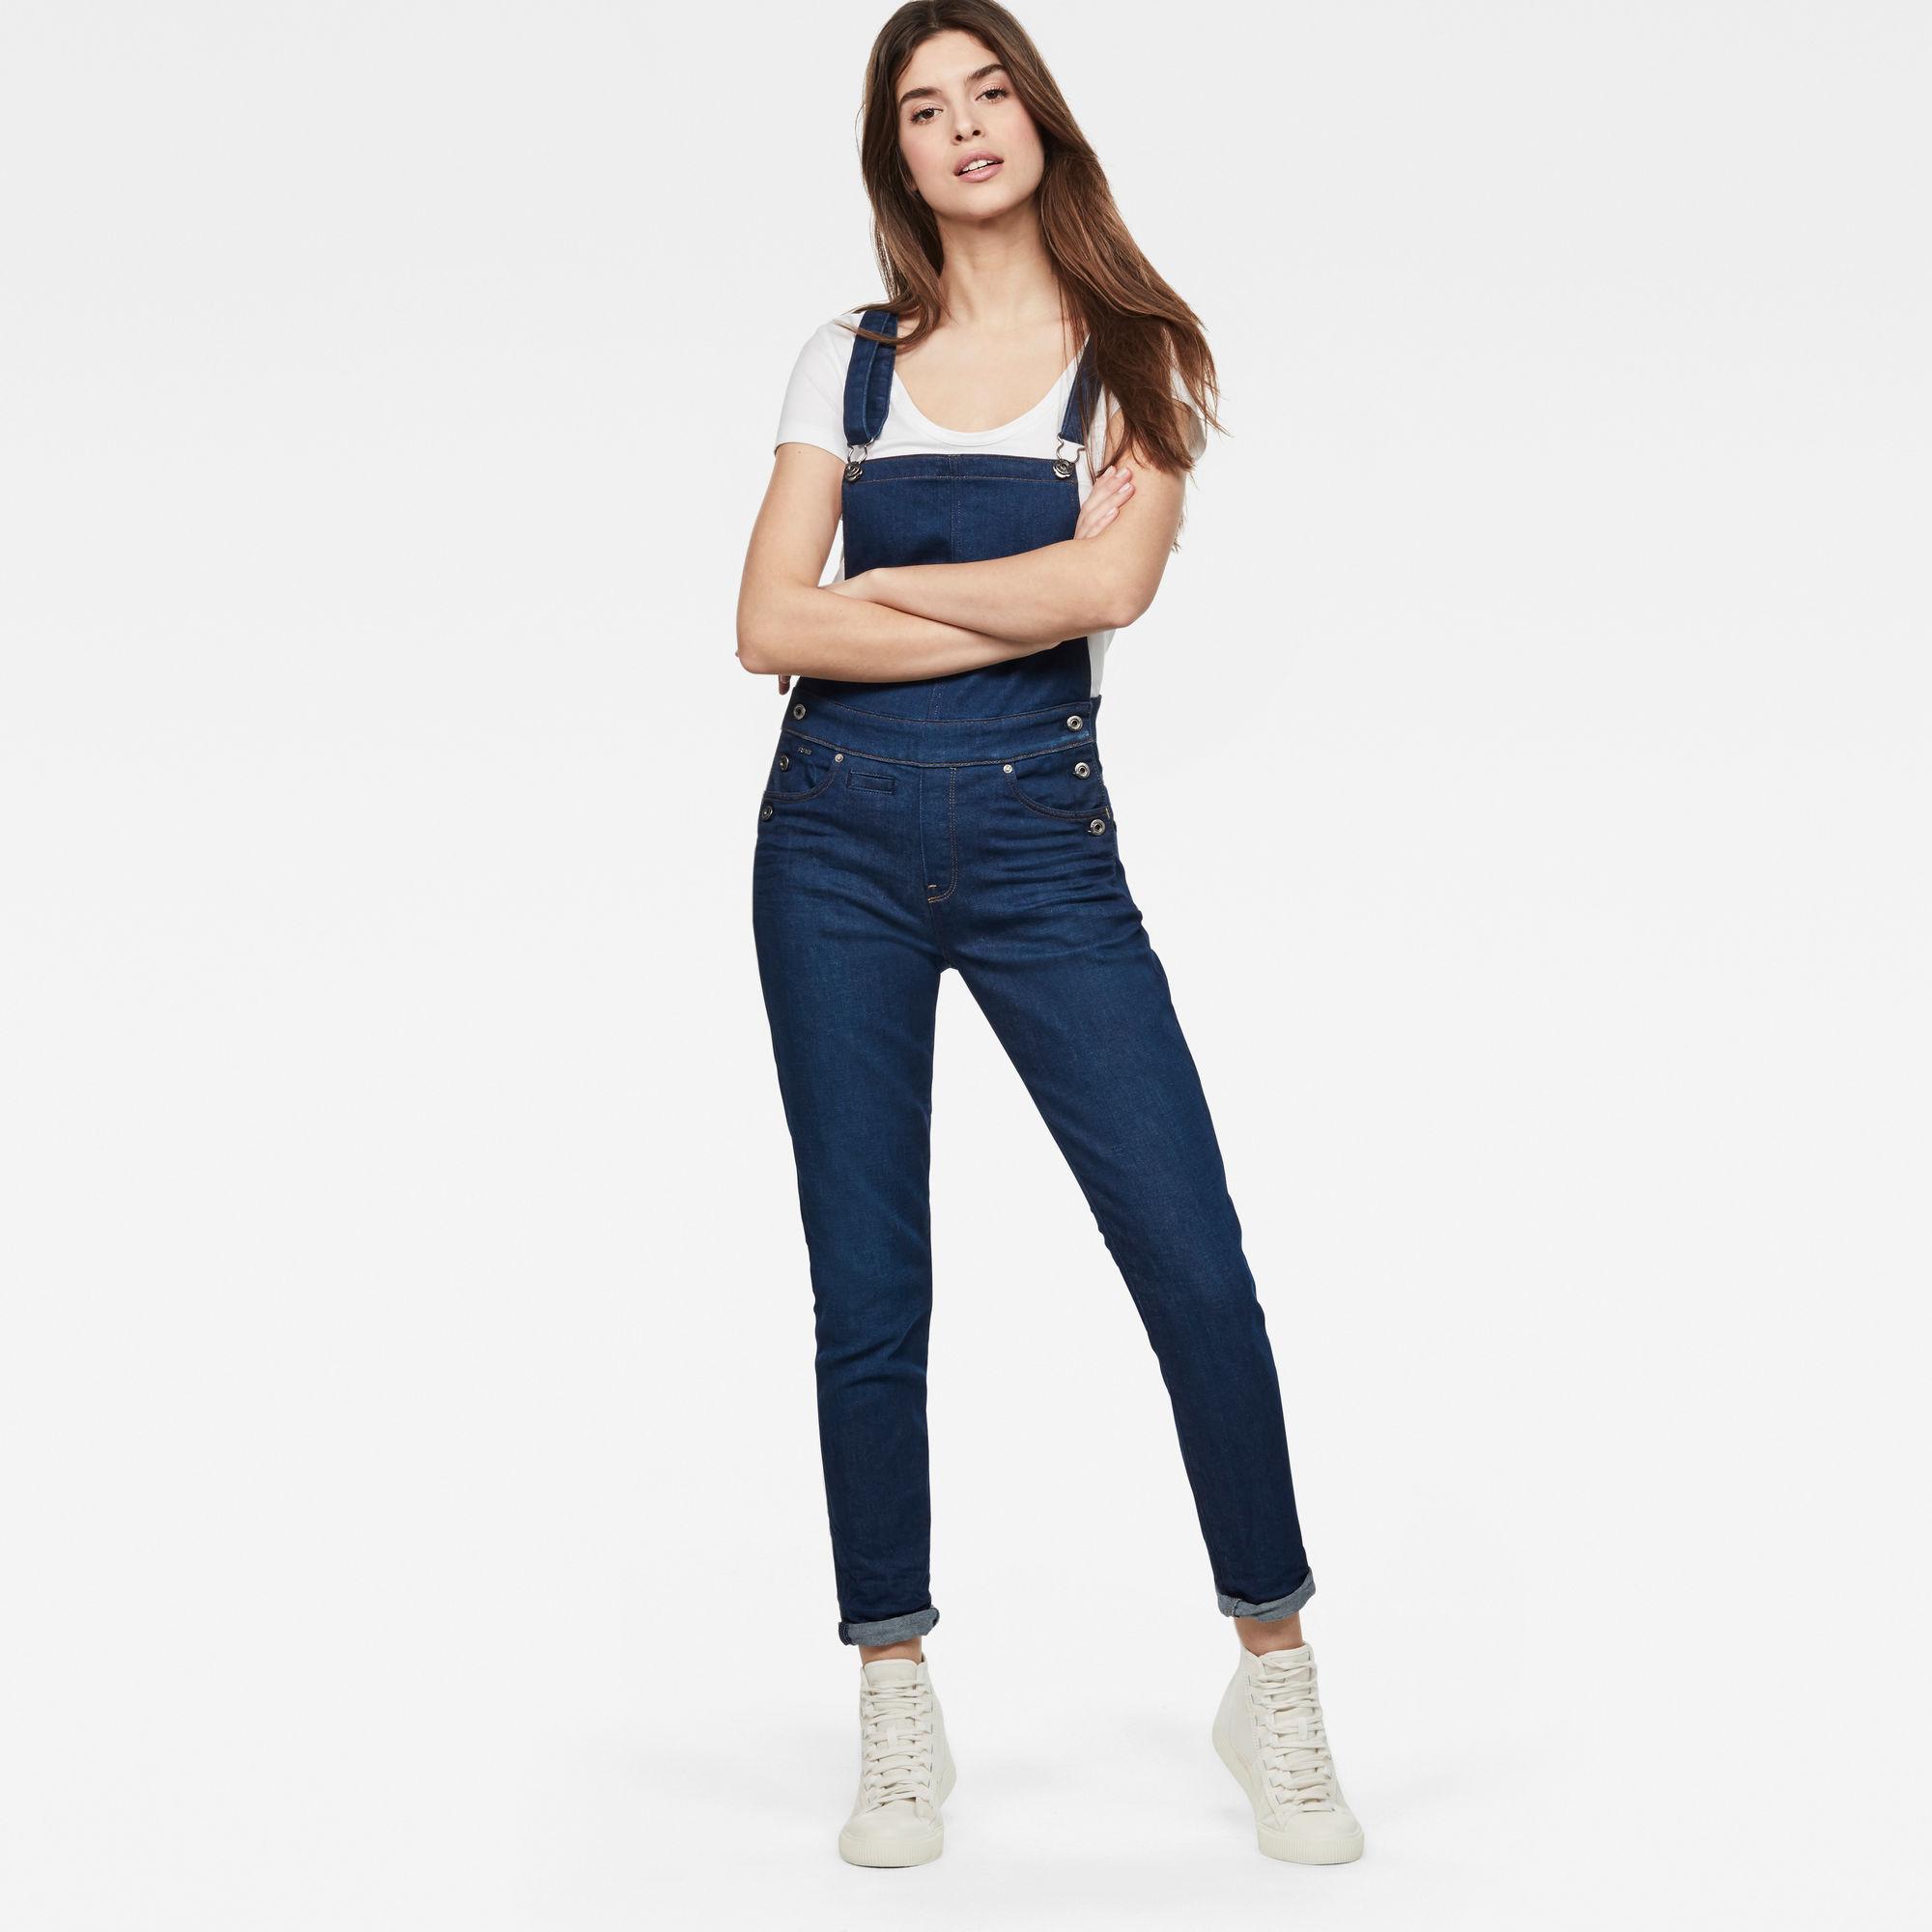 D-Staq 5-Pocket High-Waist Skinny Overalls